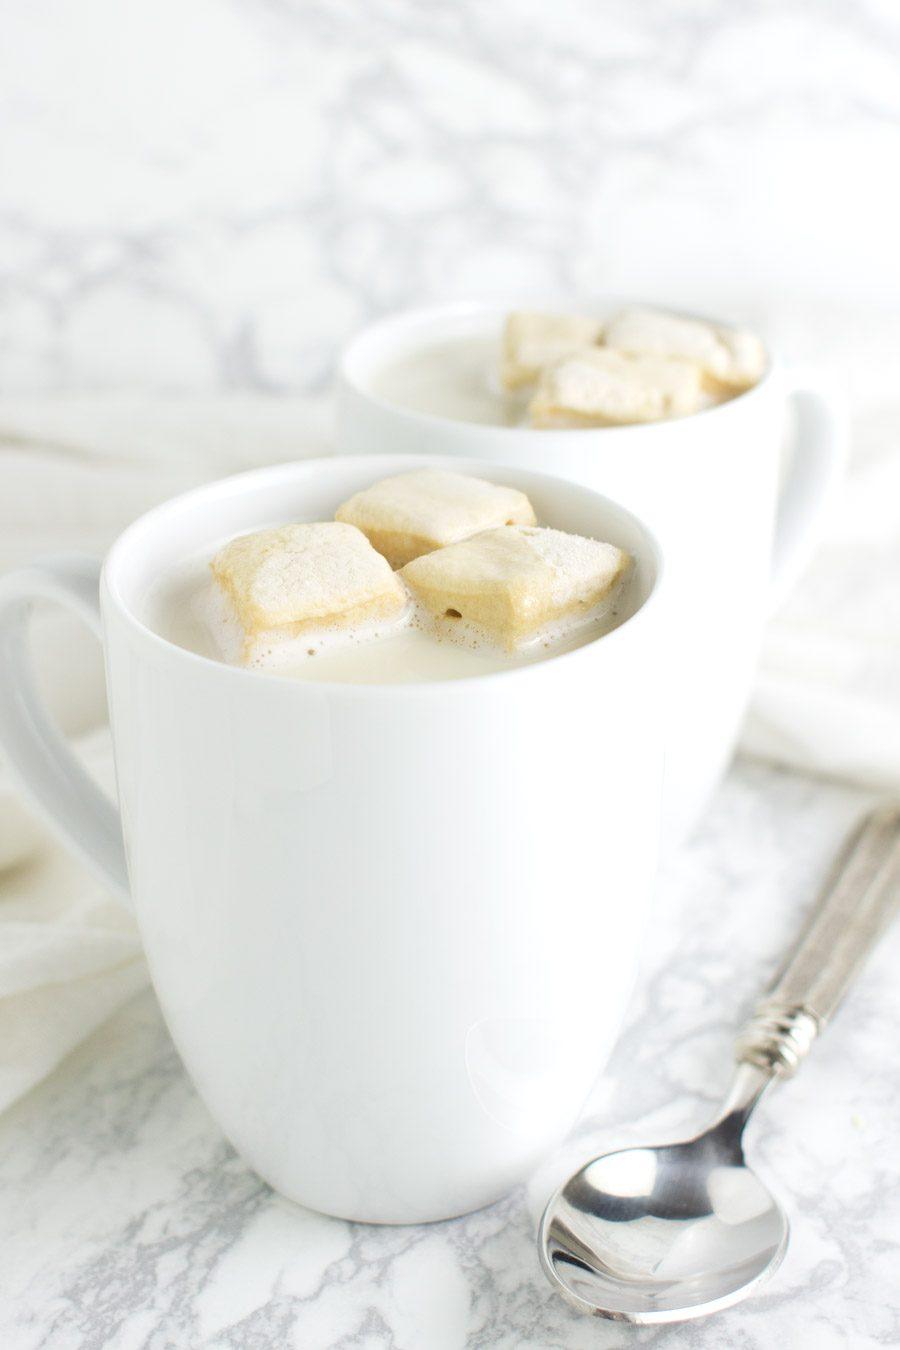 Matcha Green Tea Latte recipe from acleanplate.com #aip #paleo #autoimmuneprotocol